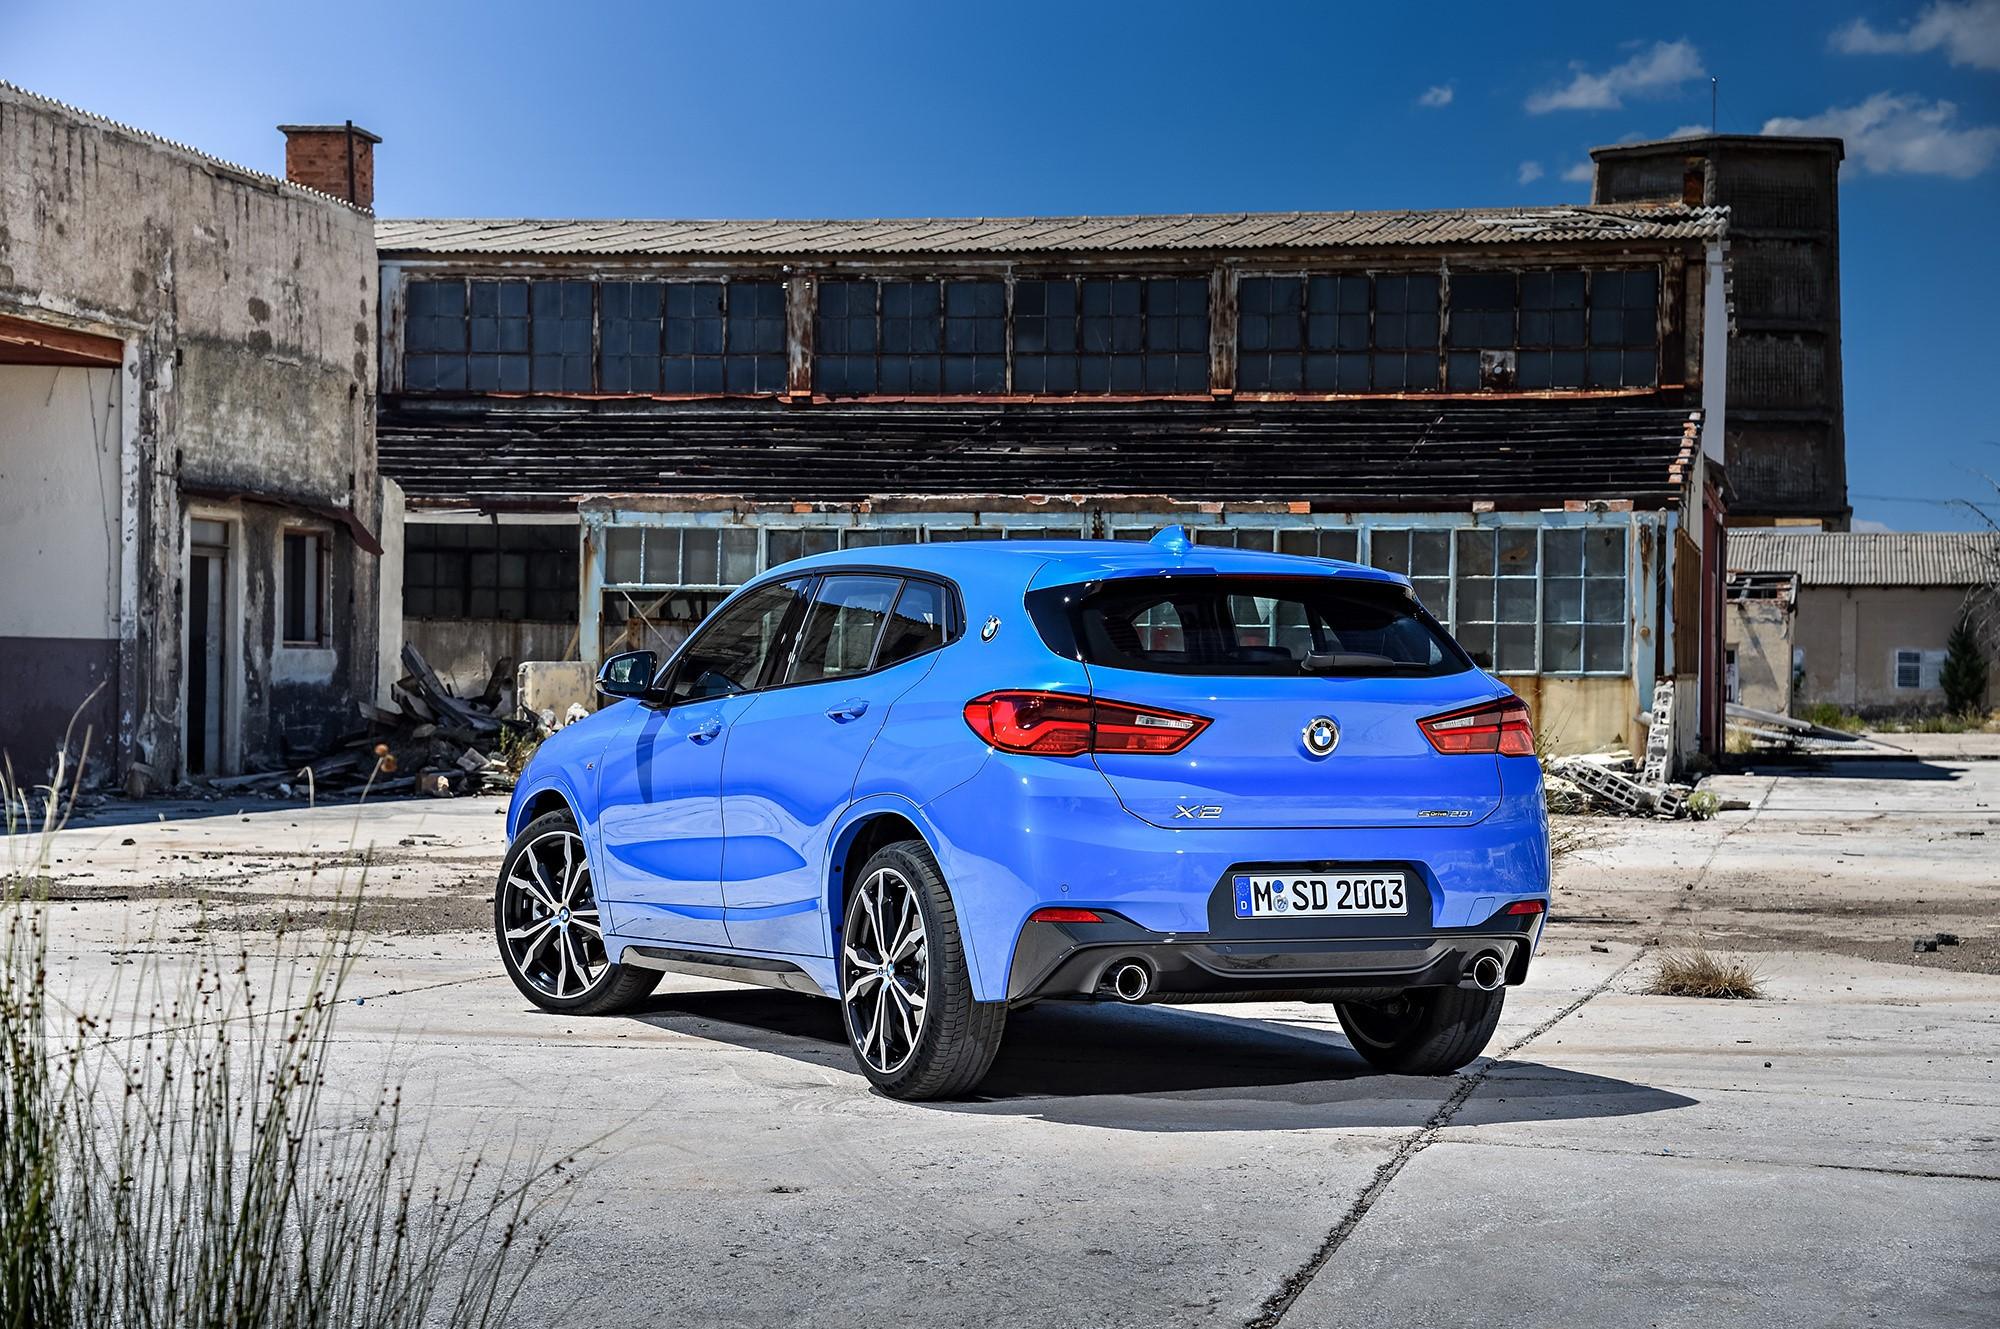 BMW X2 HD